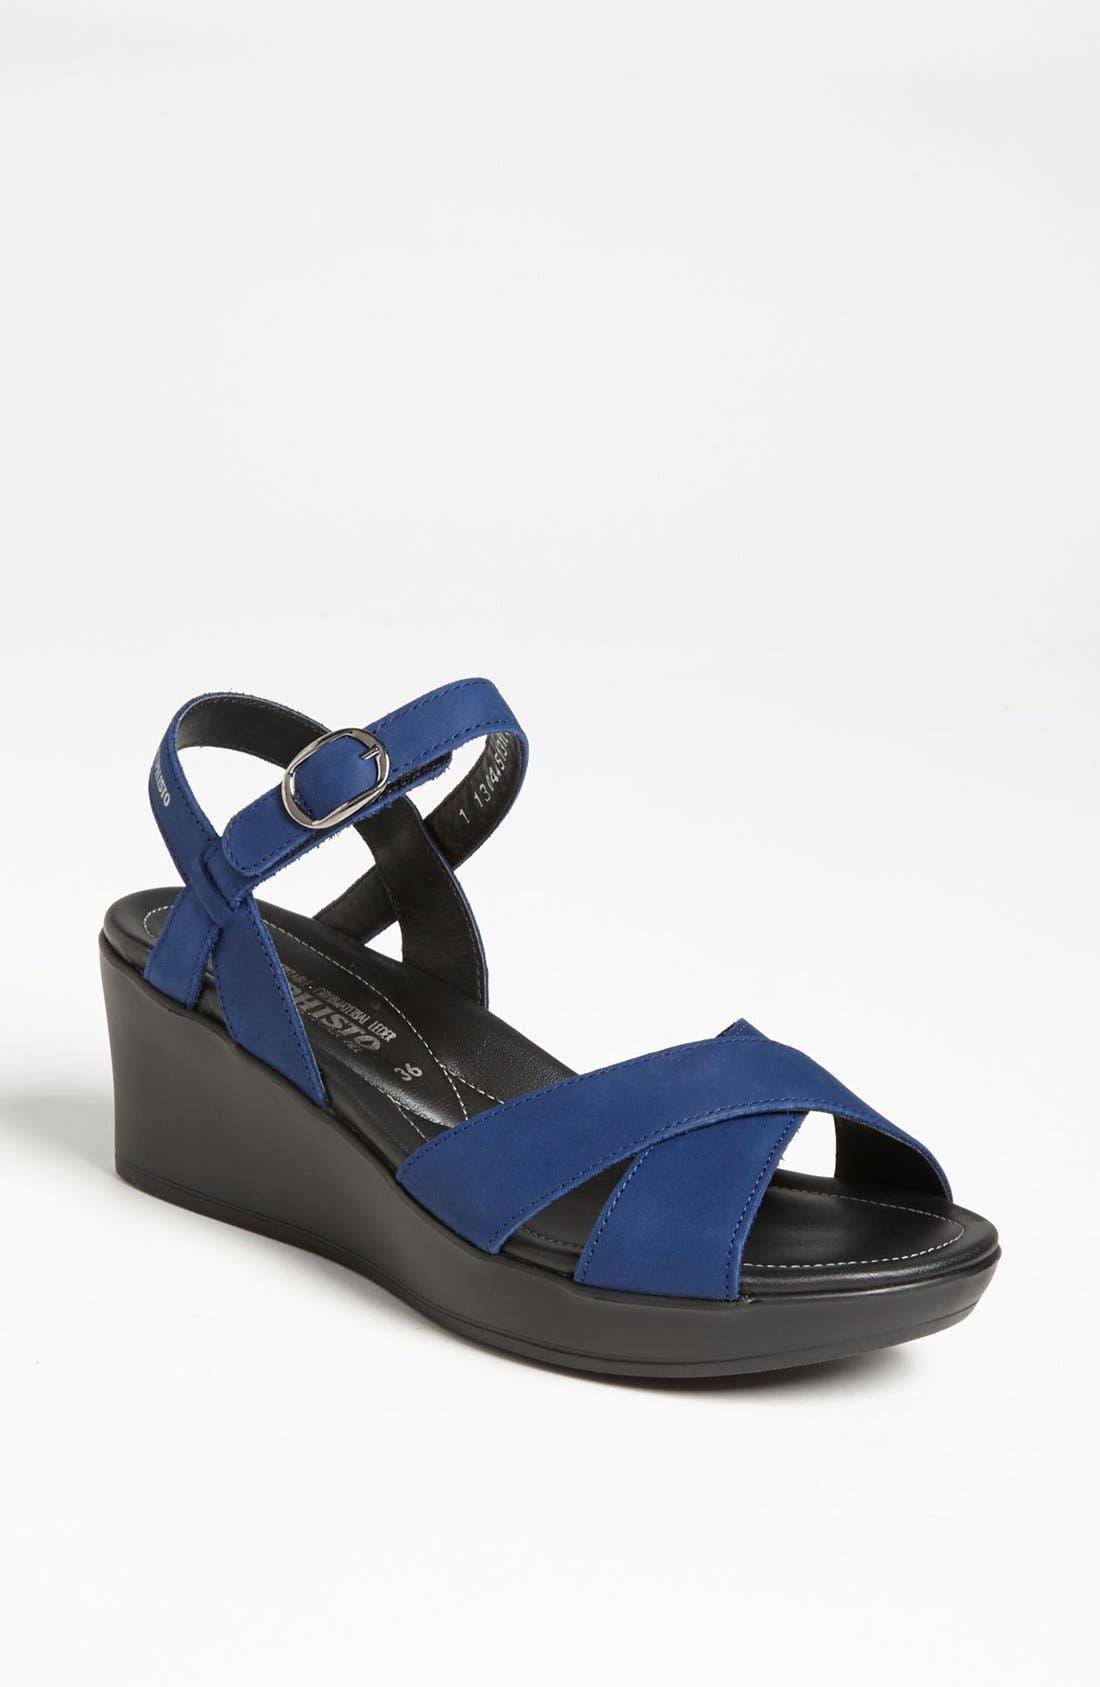 Alternate Image 1 Selected - Mephisto 'Partelia' Sandal